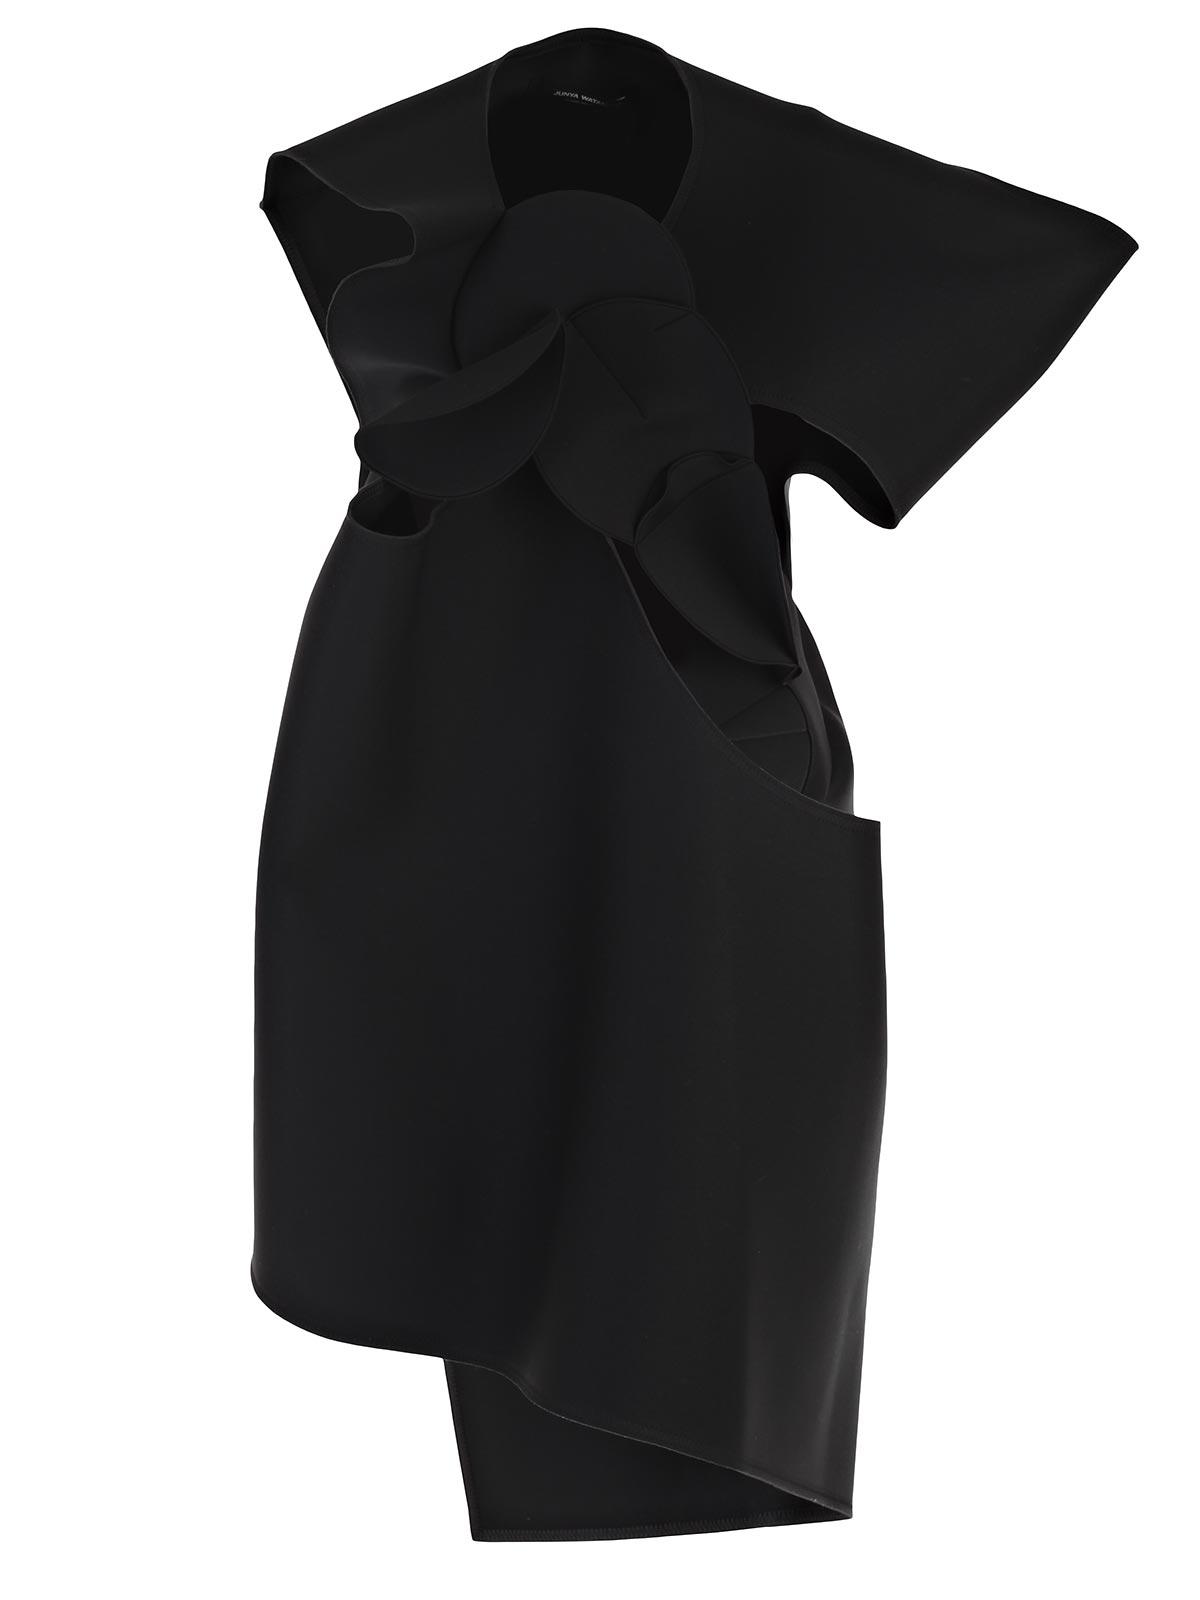 Picture of JUNYA WATANABE COMME DES GARCONS DRESS ABITO ELEGANTE